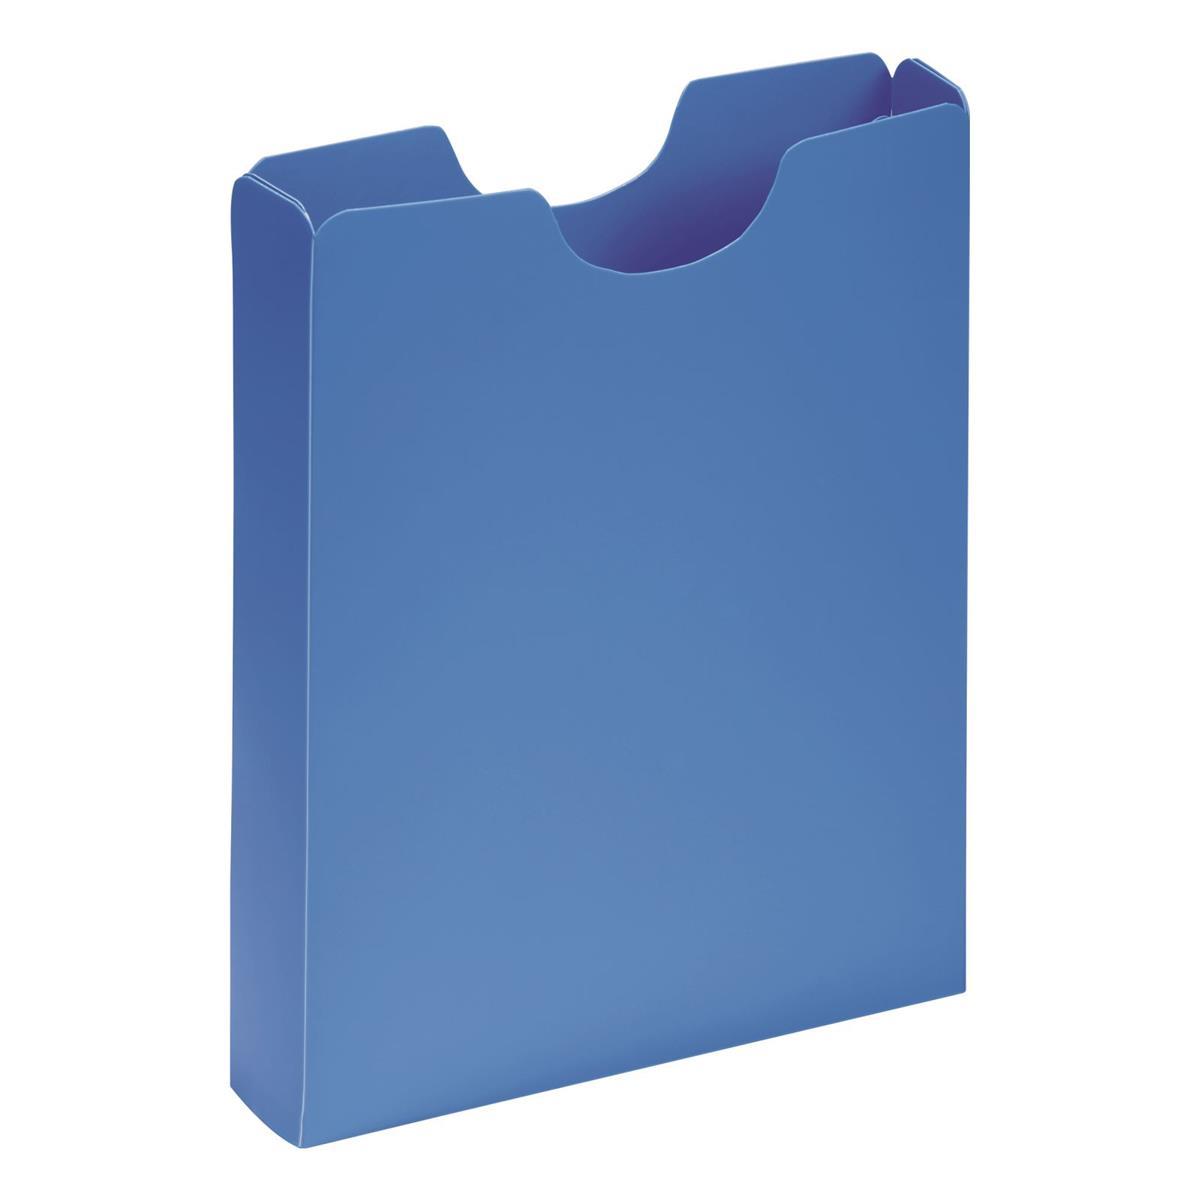 Pagna Carry Case Polypropylene A4 Light Blue Ref 2100513 [Pack 10]